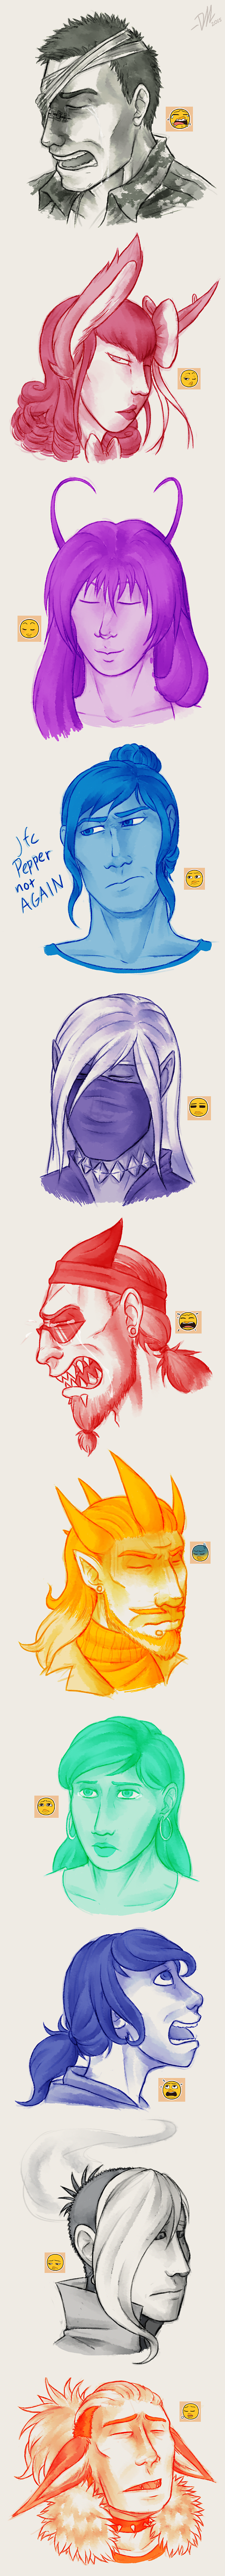 P-NO: Familiar faces 5 by Derekari